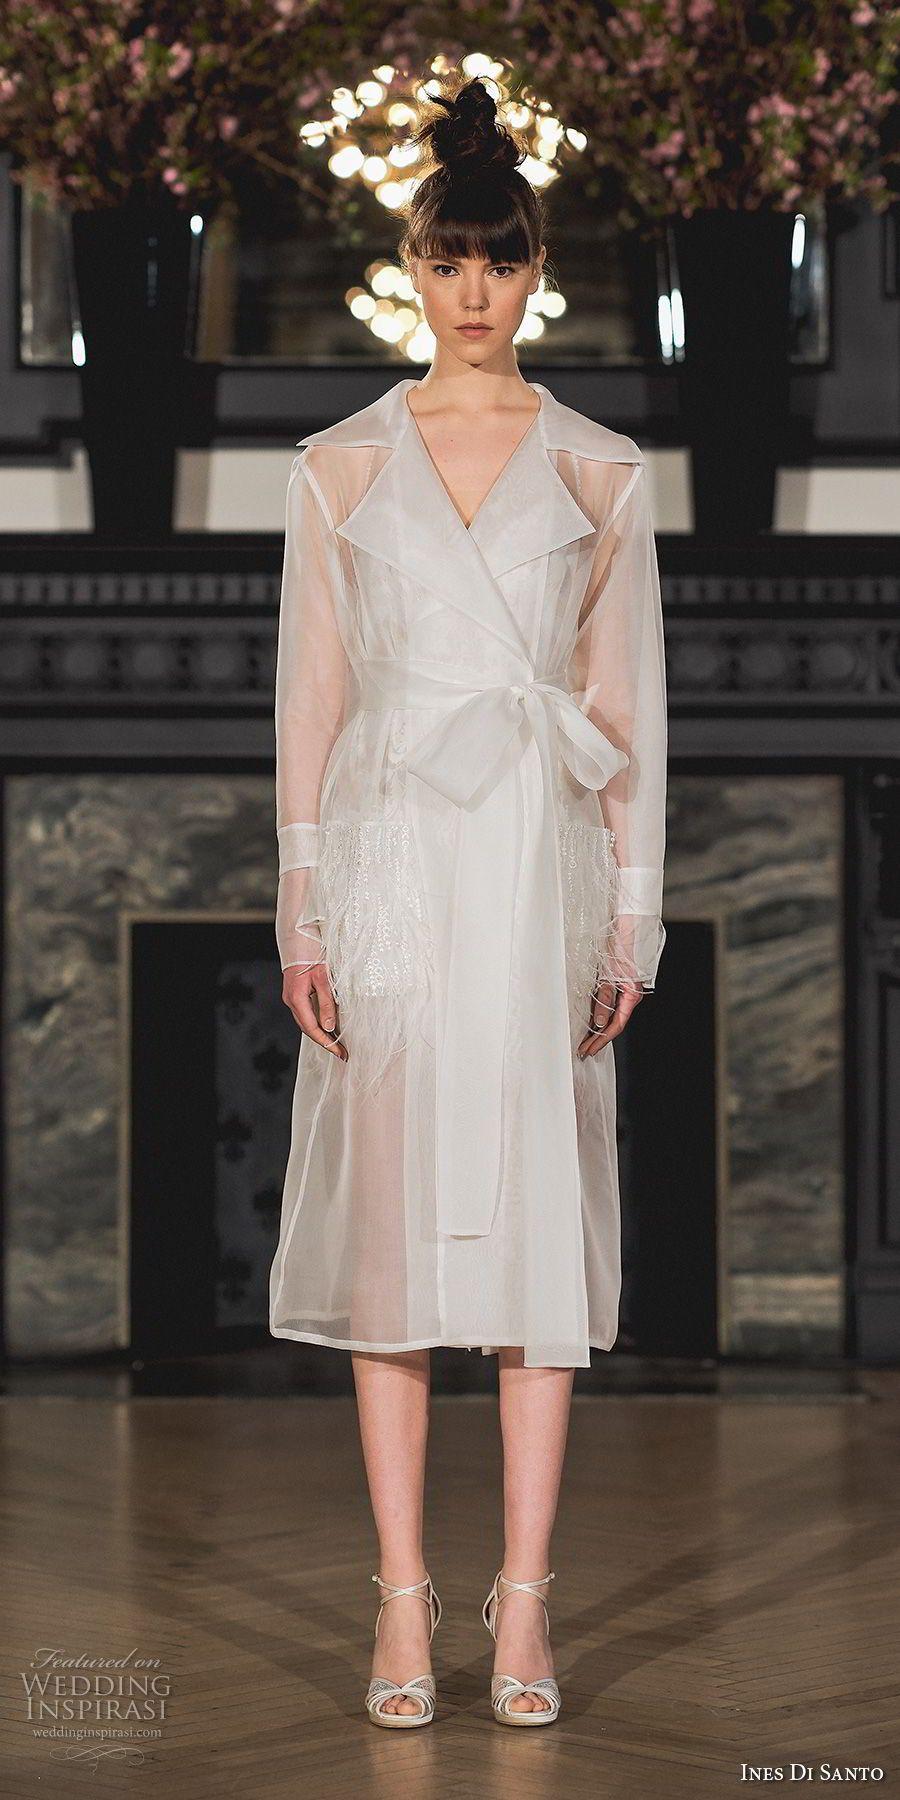 Simple modern wedding dress  Ines Di Santo Spring  Wedding Dresses u ucModern Romanceud Bridal